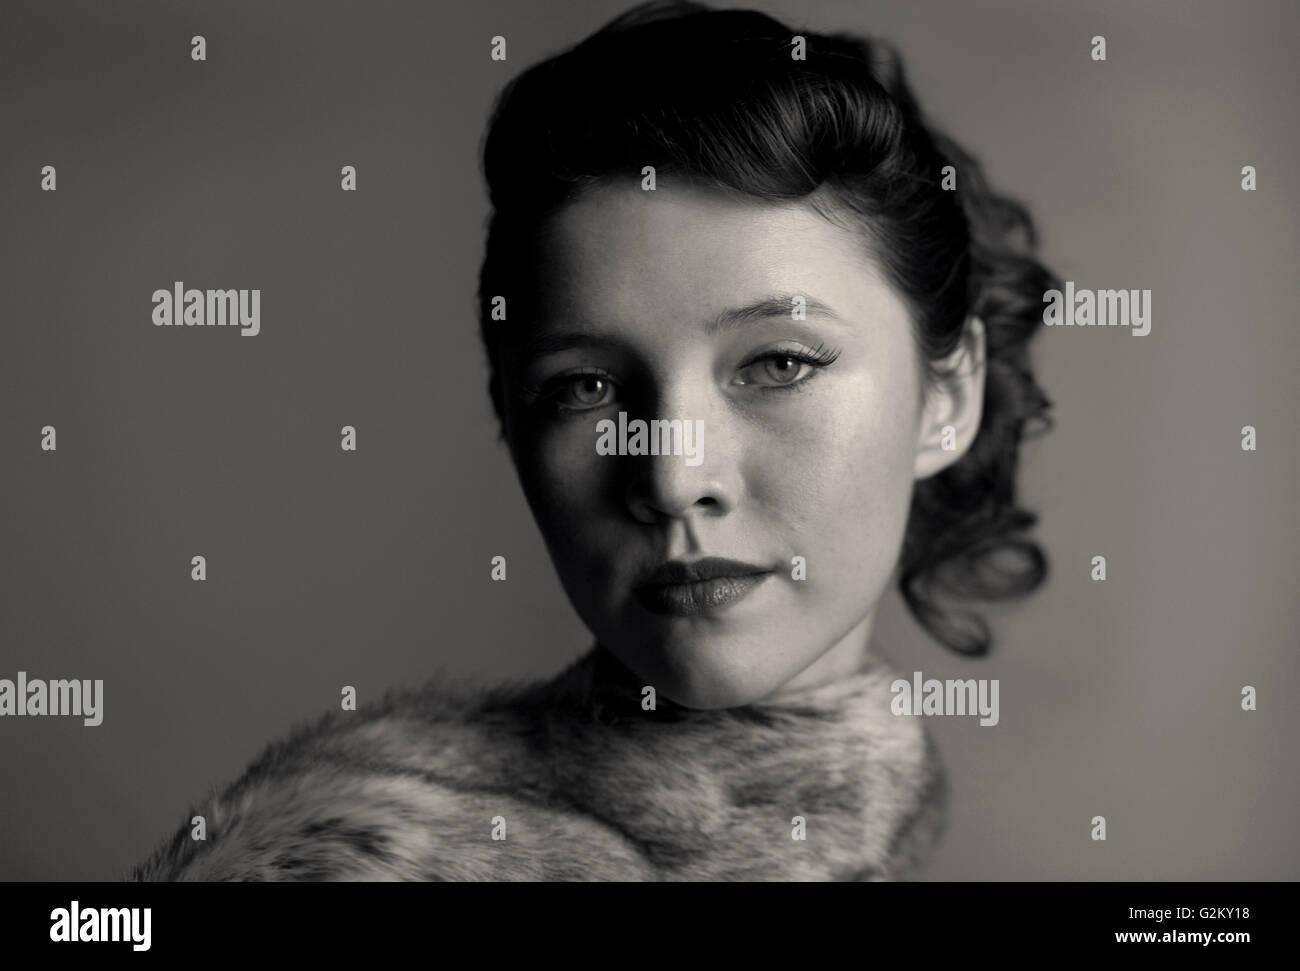 Porträt der anspruchsvolle junge Frau Stockbild